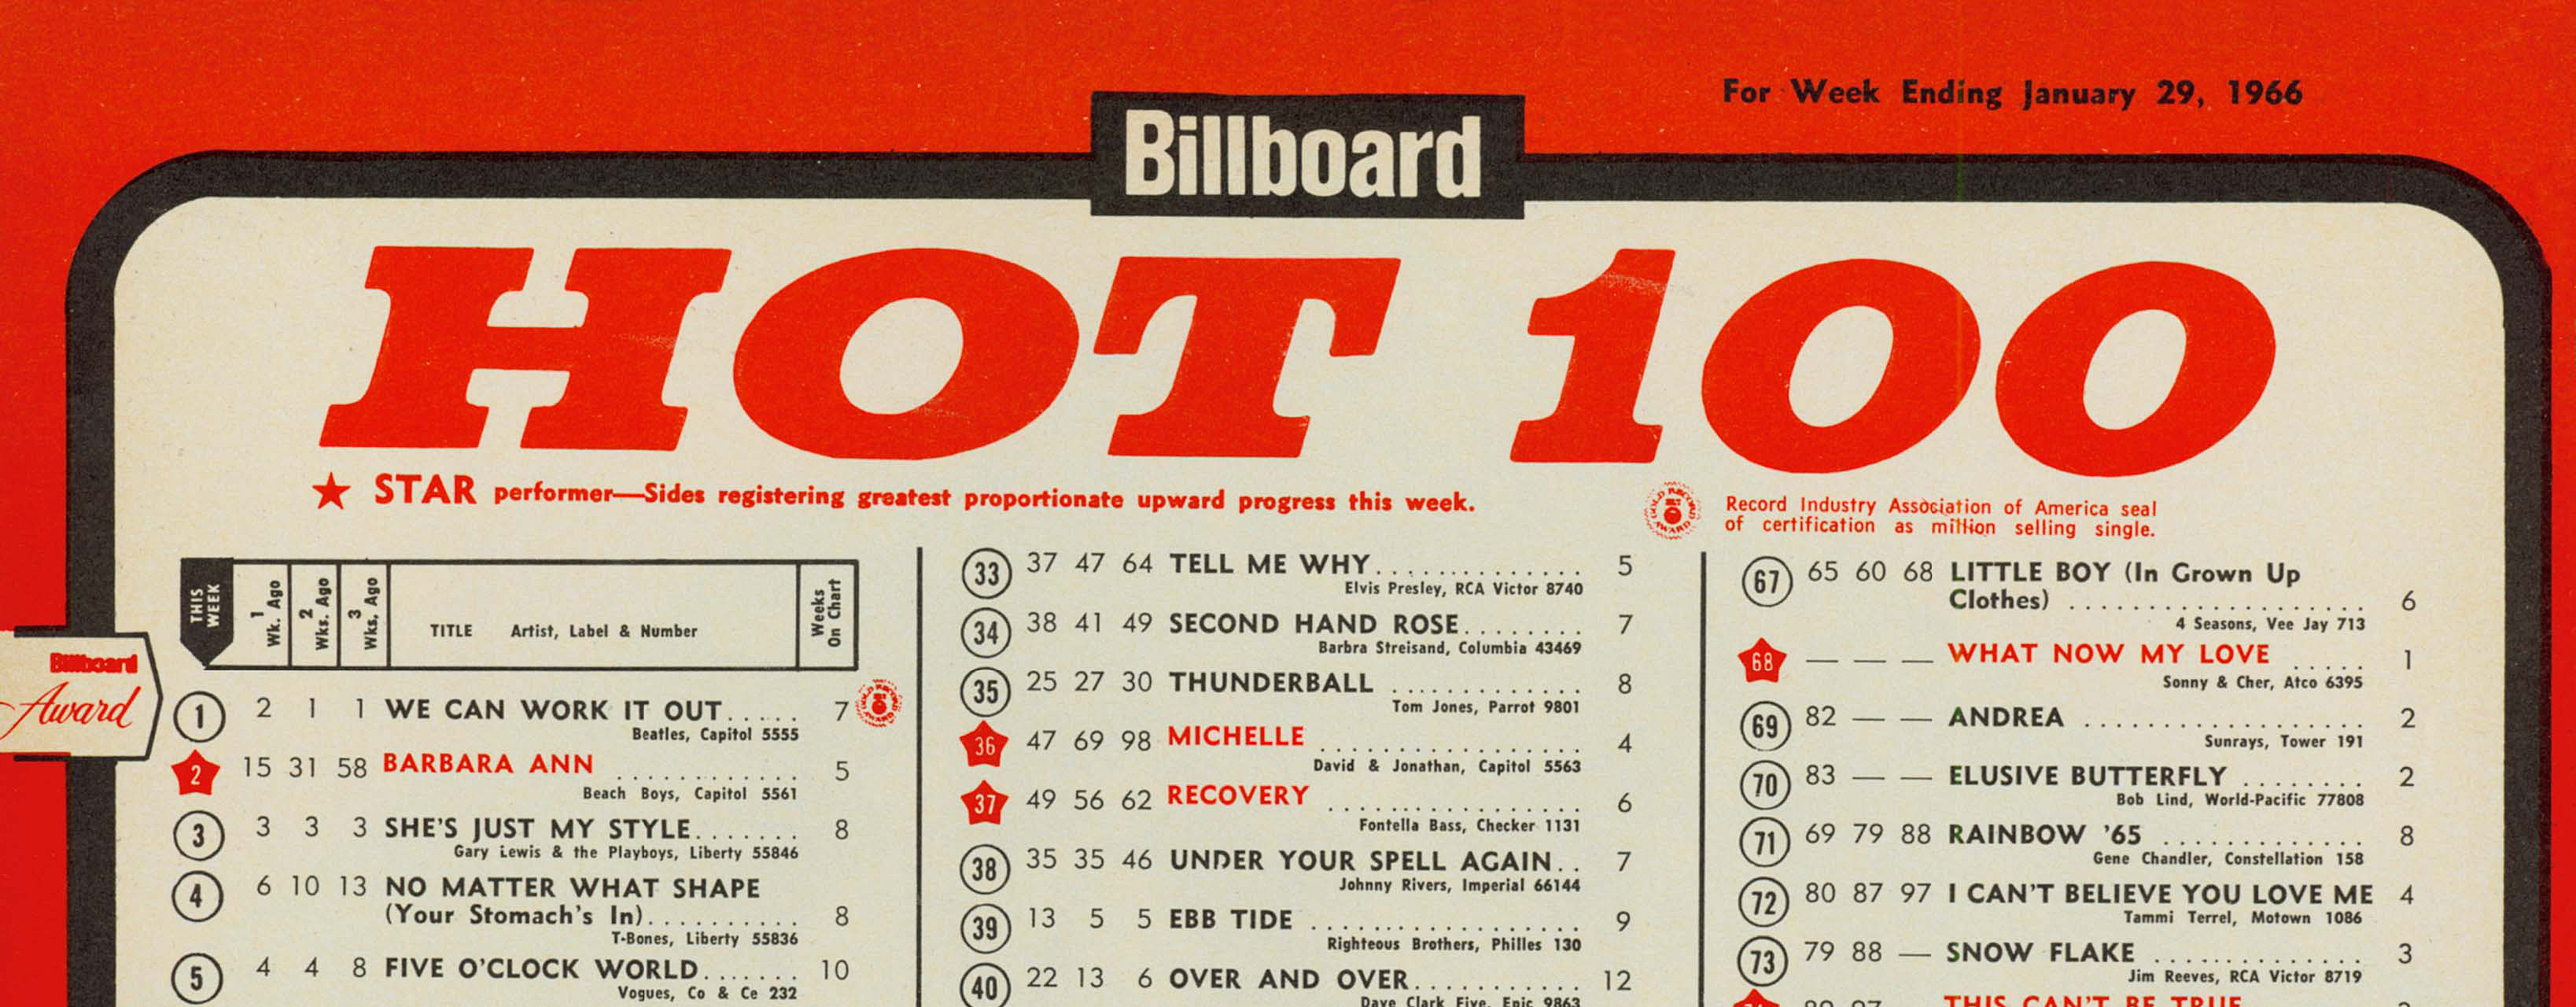 BILLBOARD Hot 100 January 29, 1966 (MCRFB TOP 5)